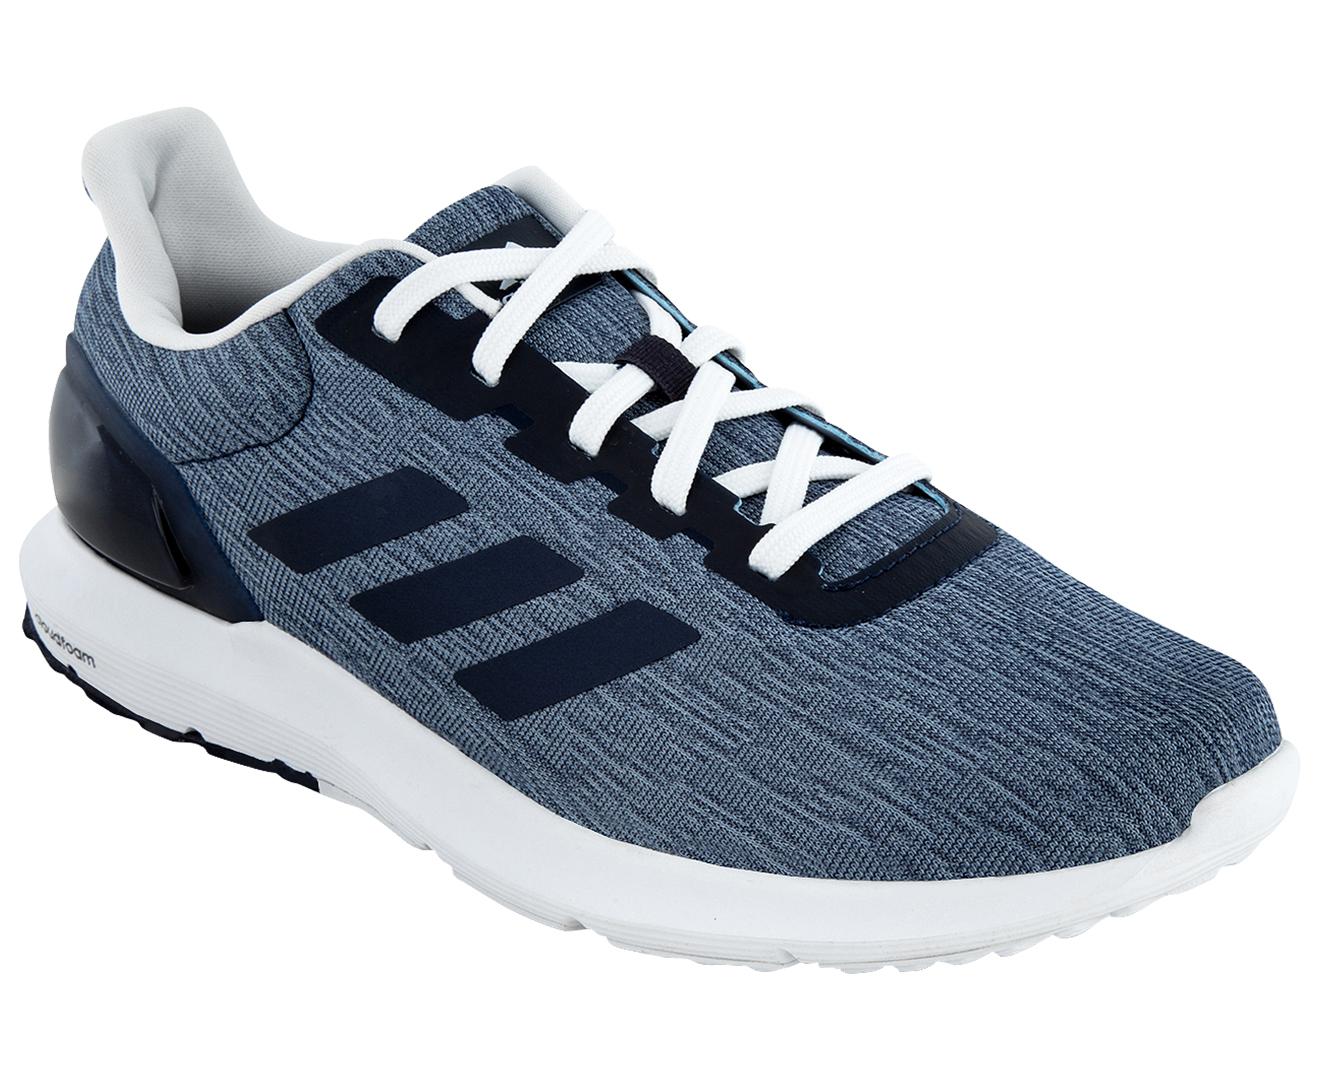 af05dec96b9 Adidas Women s Cosmic 2.0 Shoe - Collegiate Navy Track Blue